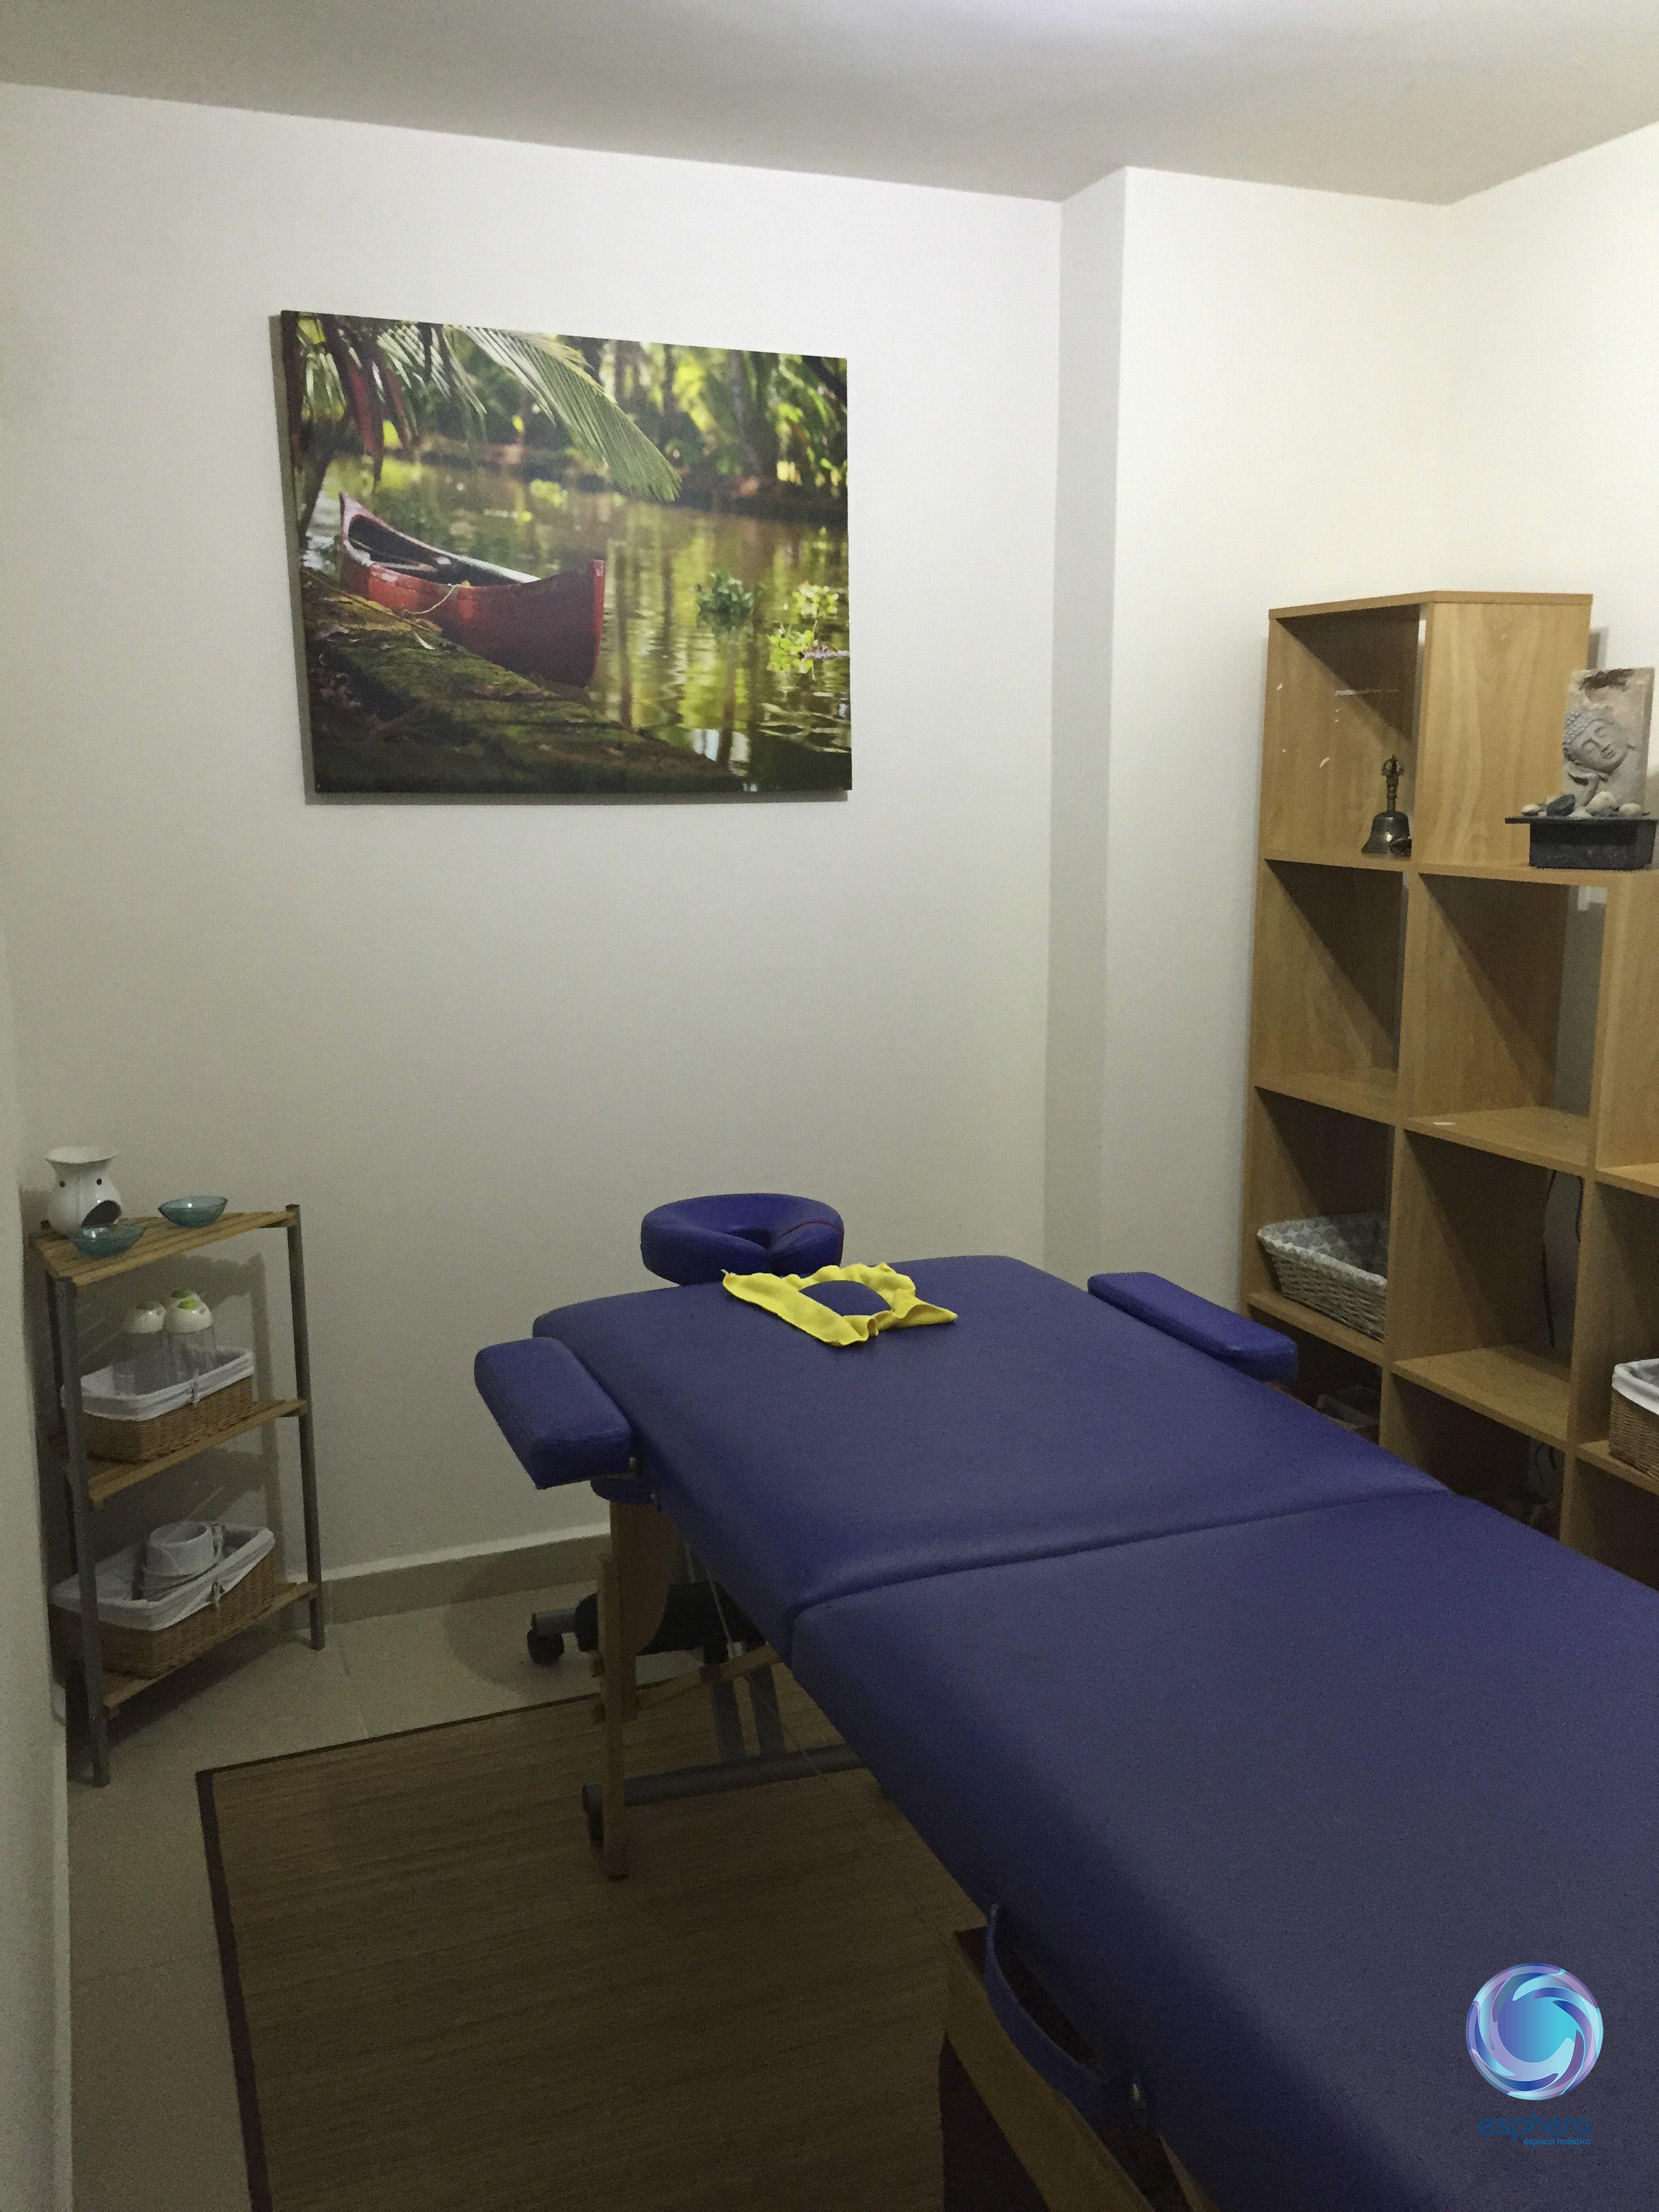 Agua Cabina Para Terapias F Sicas Reiki Masajes Fisioterapia  # Muebles Fisioterapia